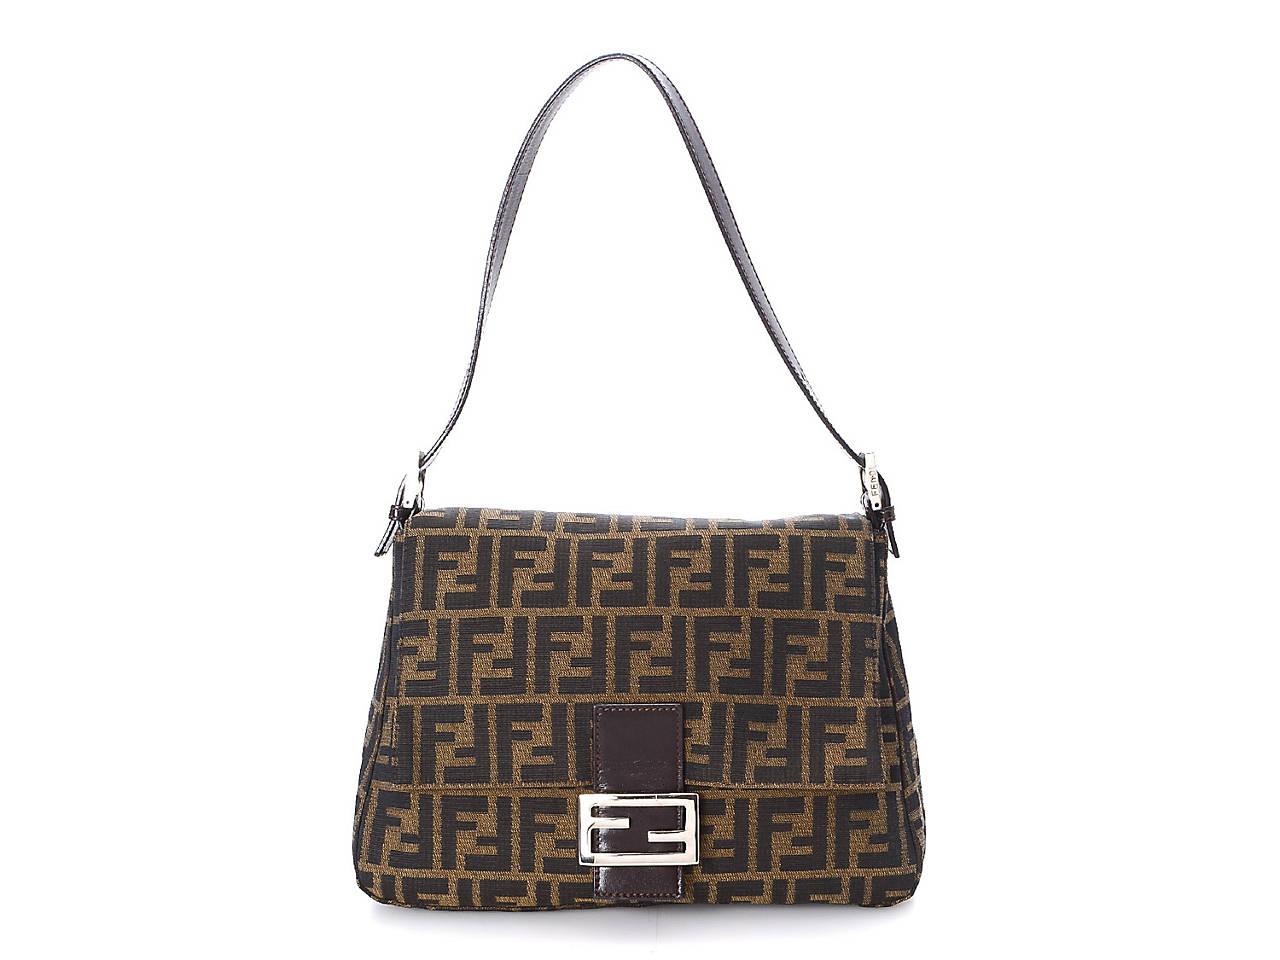 b1d5f32622 Fendi - Vintage Luxury Zucca Mamma Shoulder Bag Women s Handbags ...